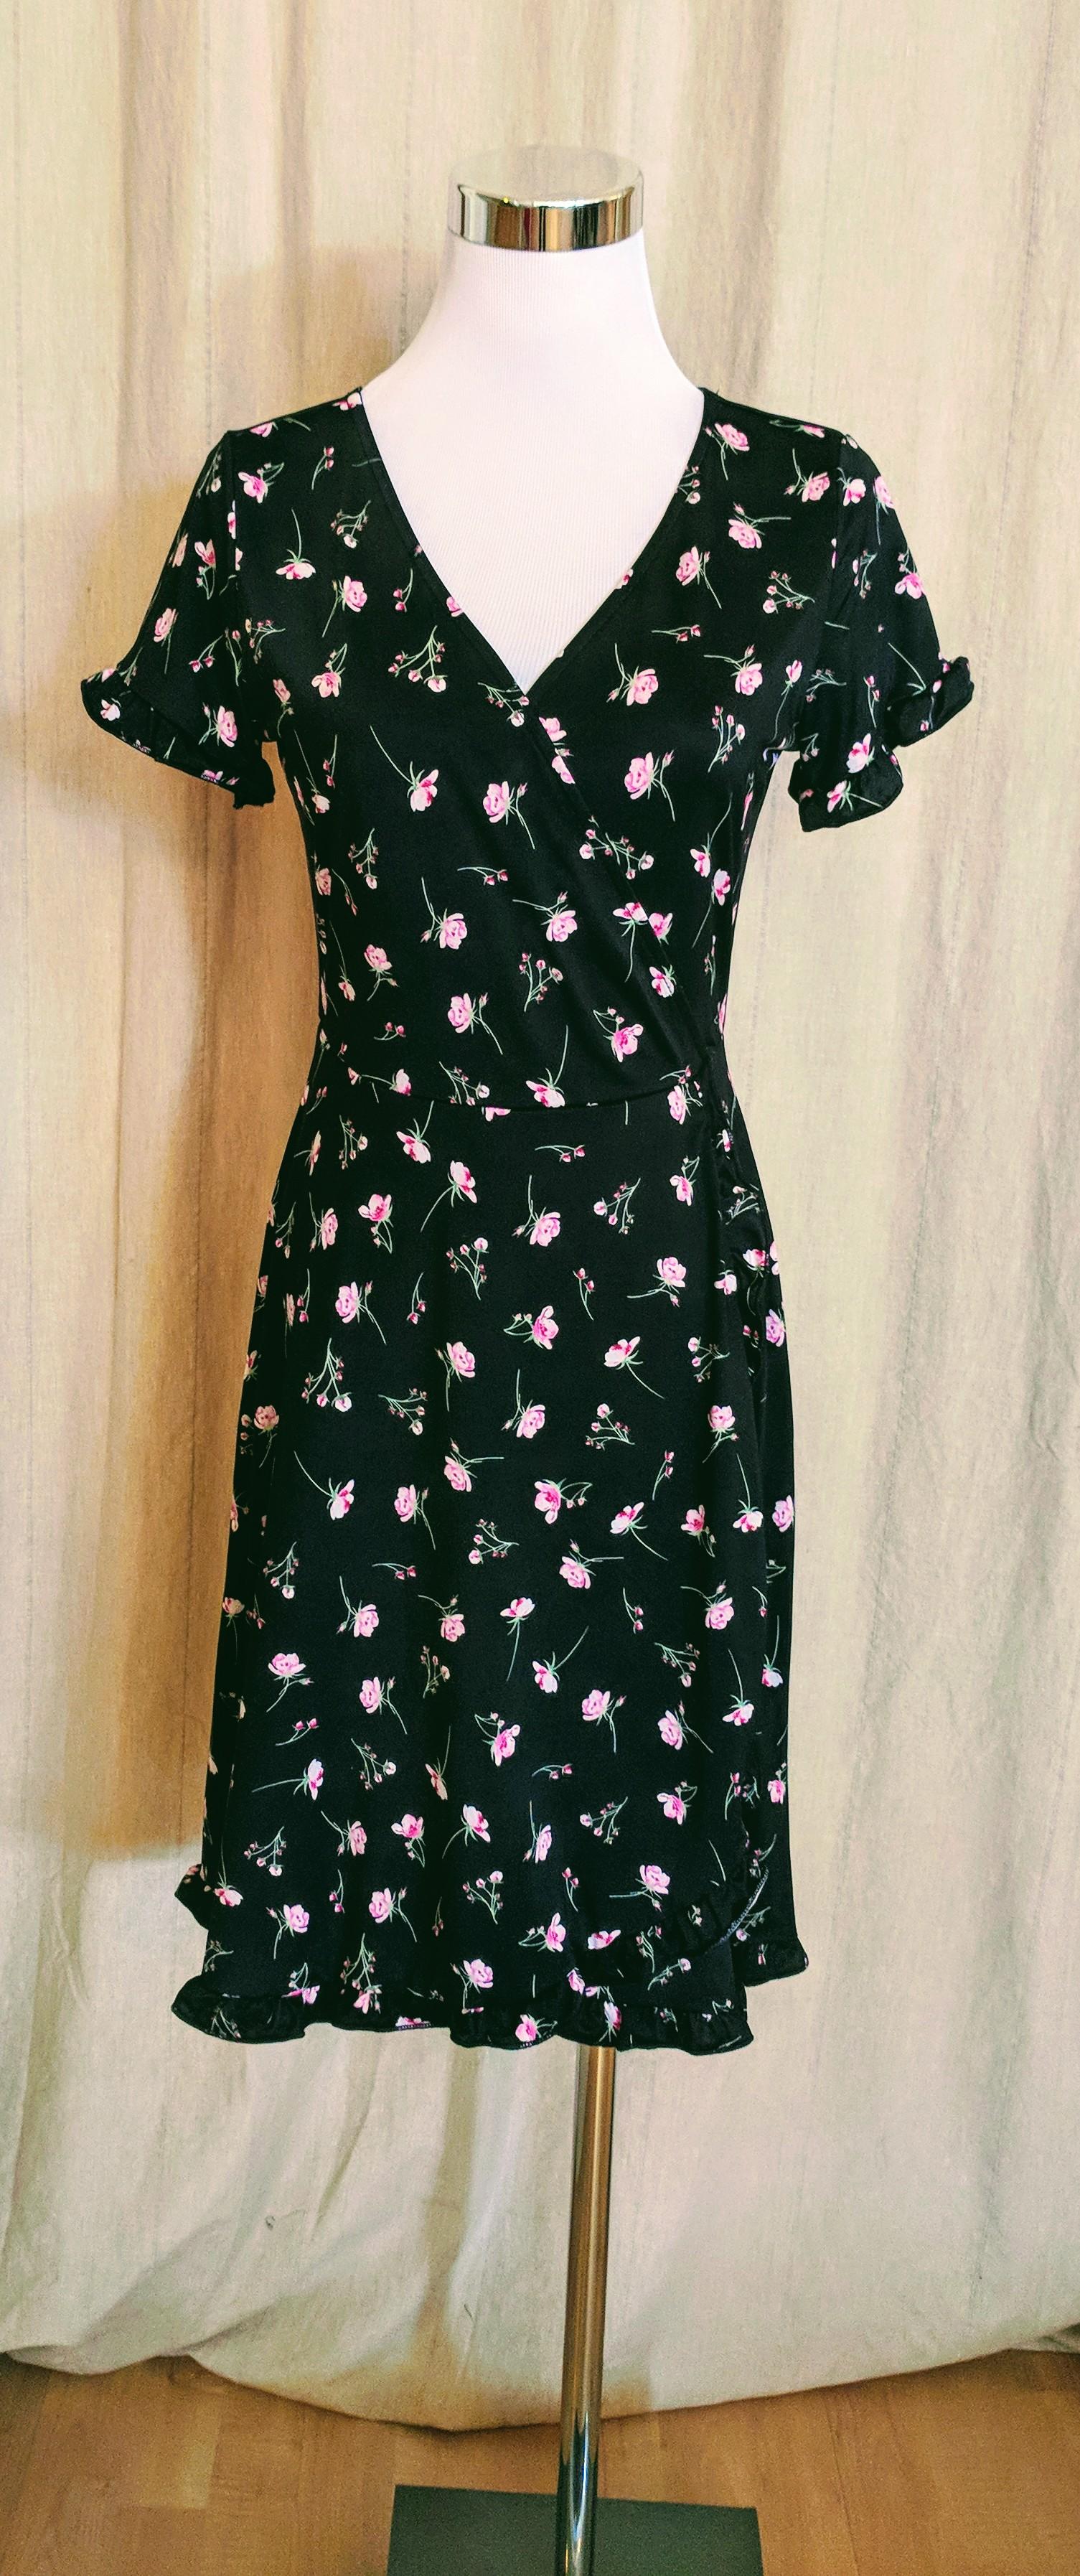 Black and pink floral shift dress $48